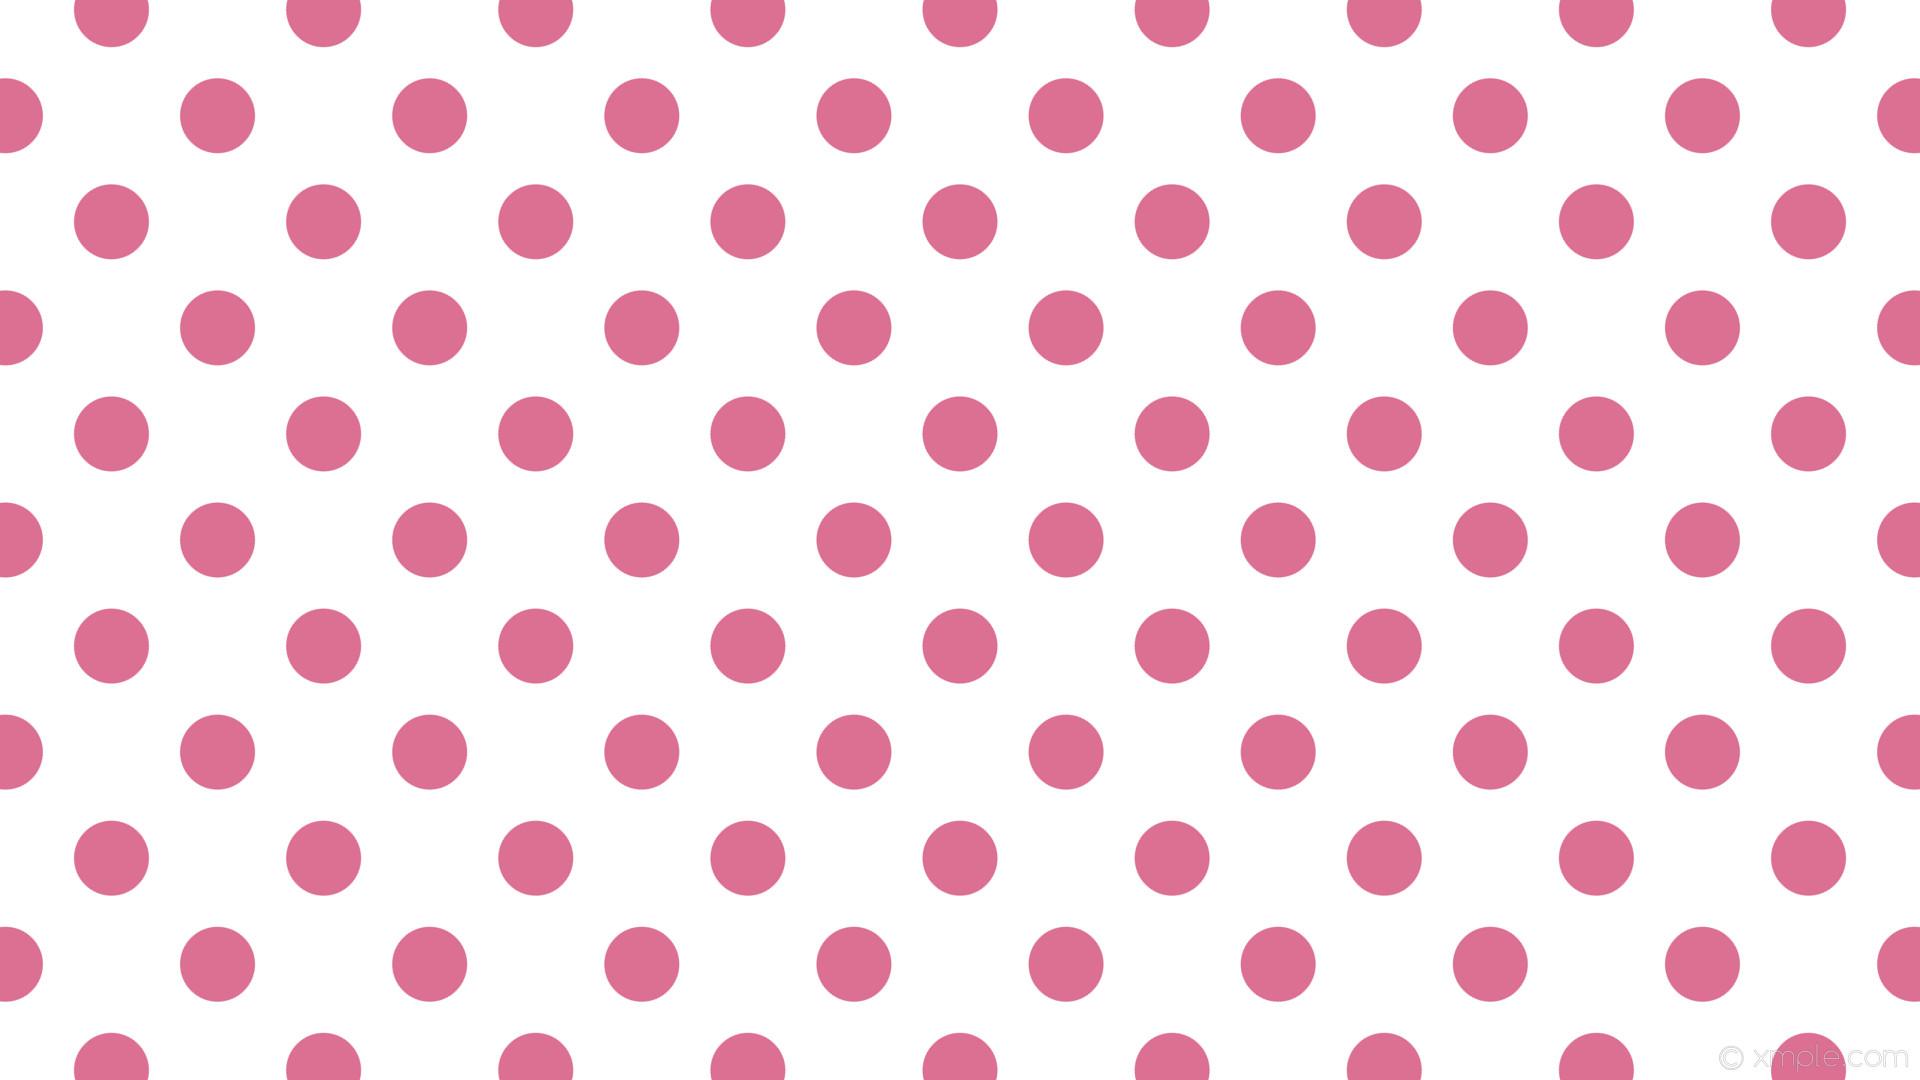 wallpaper white polka dots pink spots pale violet red #ffffff #db7093 315°  75px